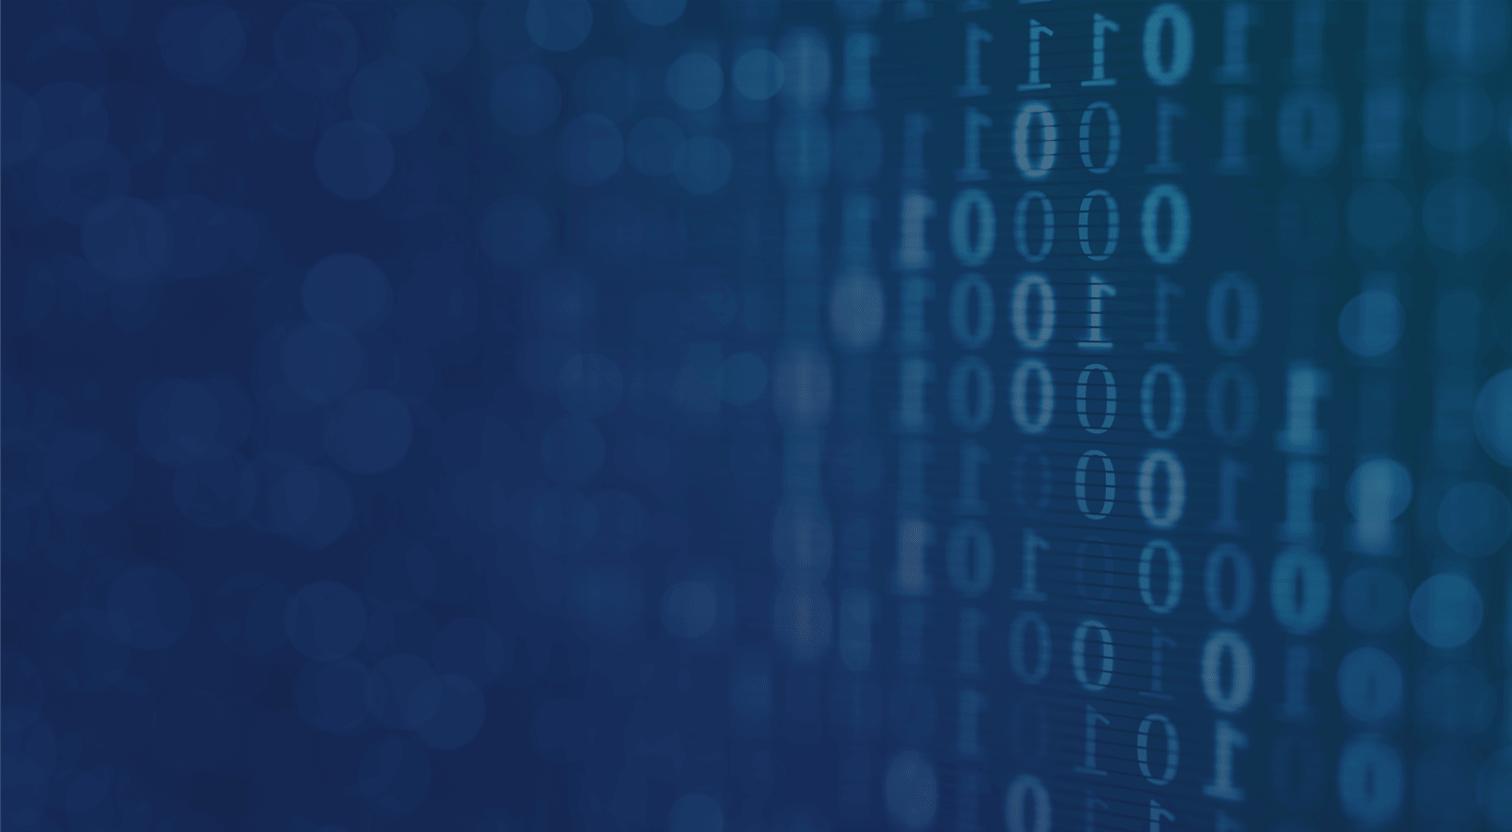 Digital intelligence artificielle